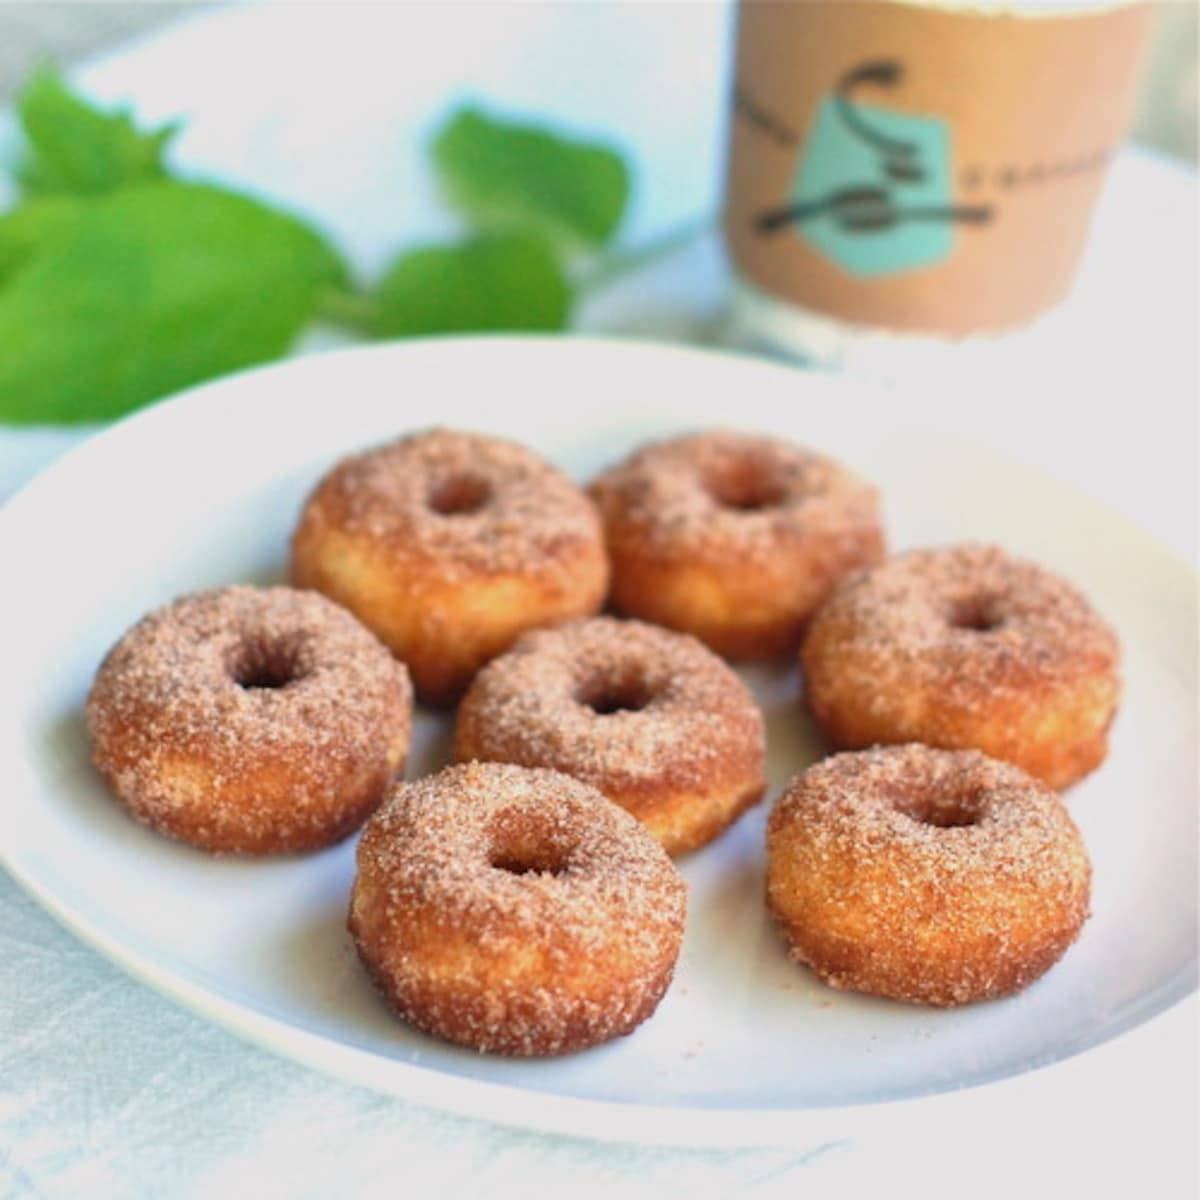 Cinnamon sugar mini donuts on a plate.